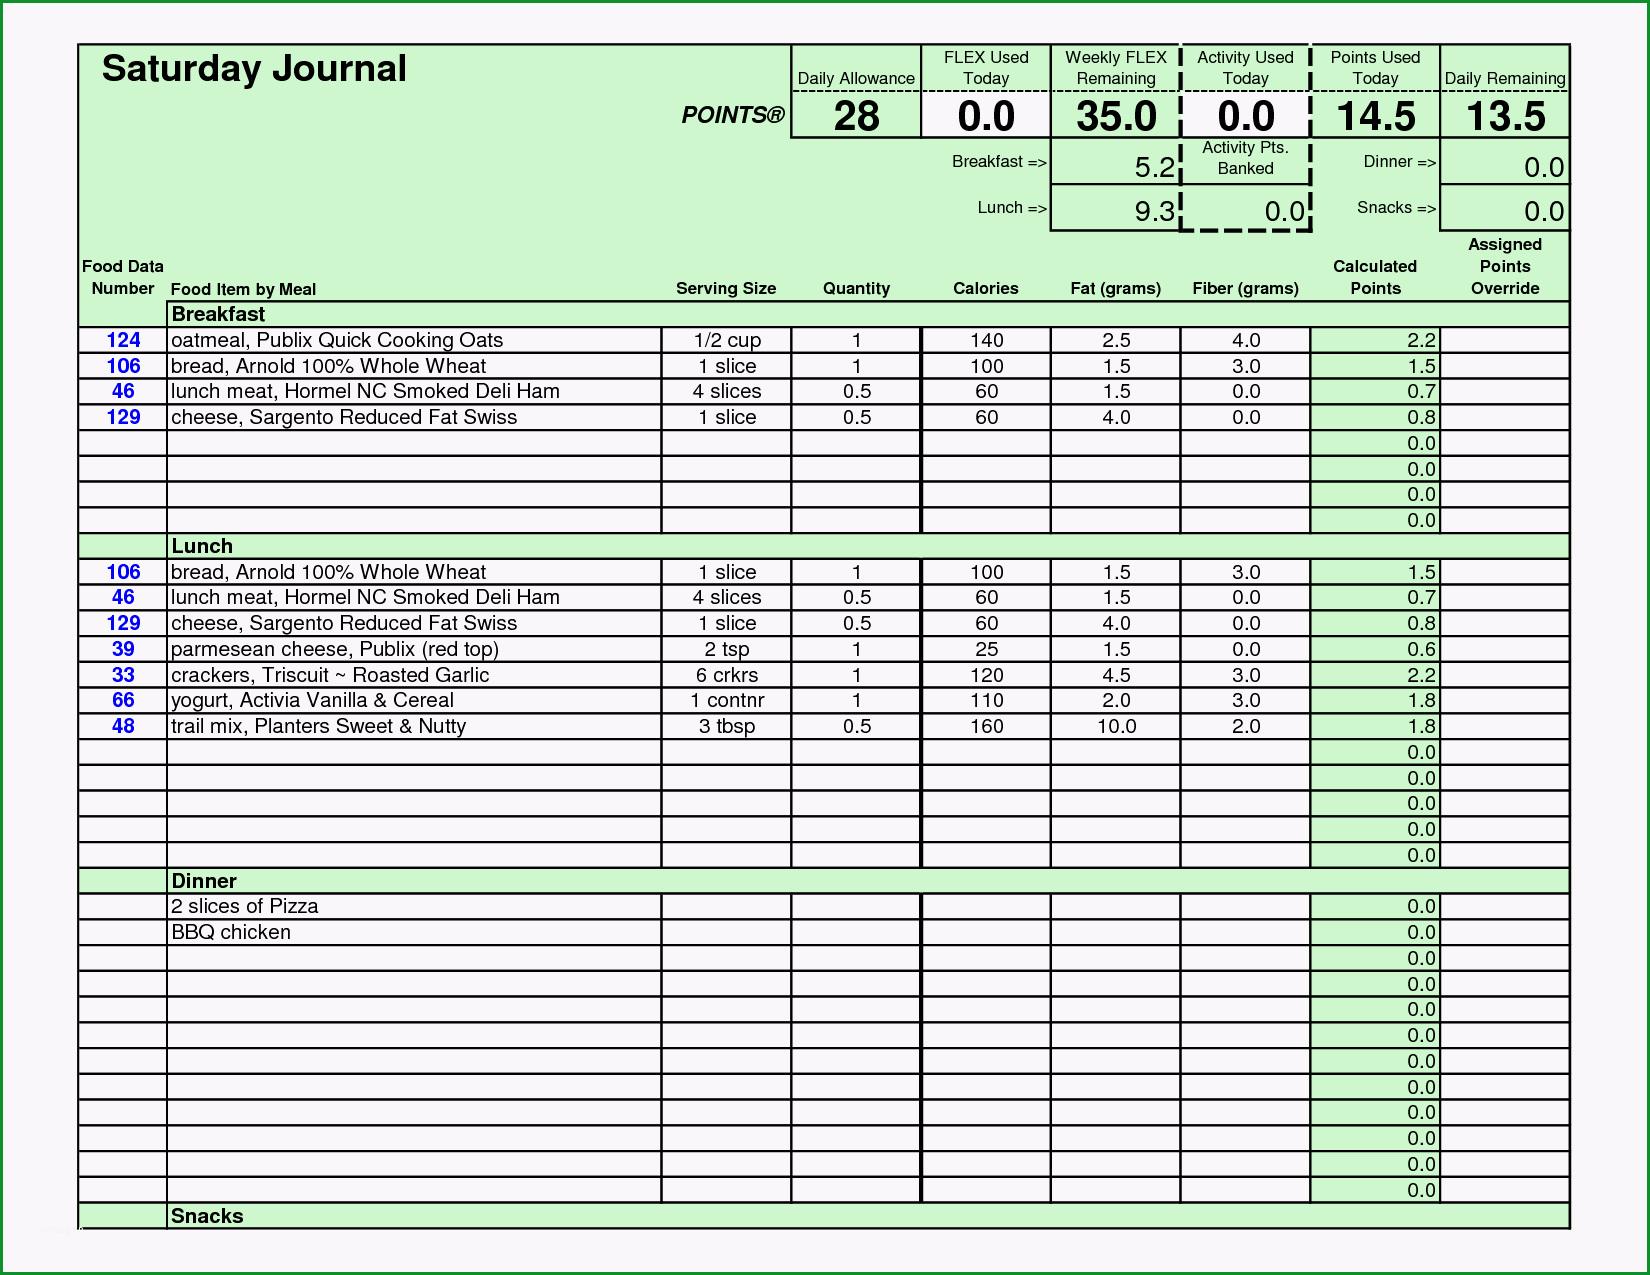 weight watchers points journal template llELLhF6vOy8VxW2vR9oPVmz4DkoAFRNqmHOlJPz2t8SrvEg1S61lbp kSasgeFUOuxiLUlNXTr0OV22XNRjWg